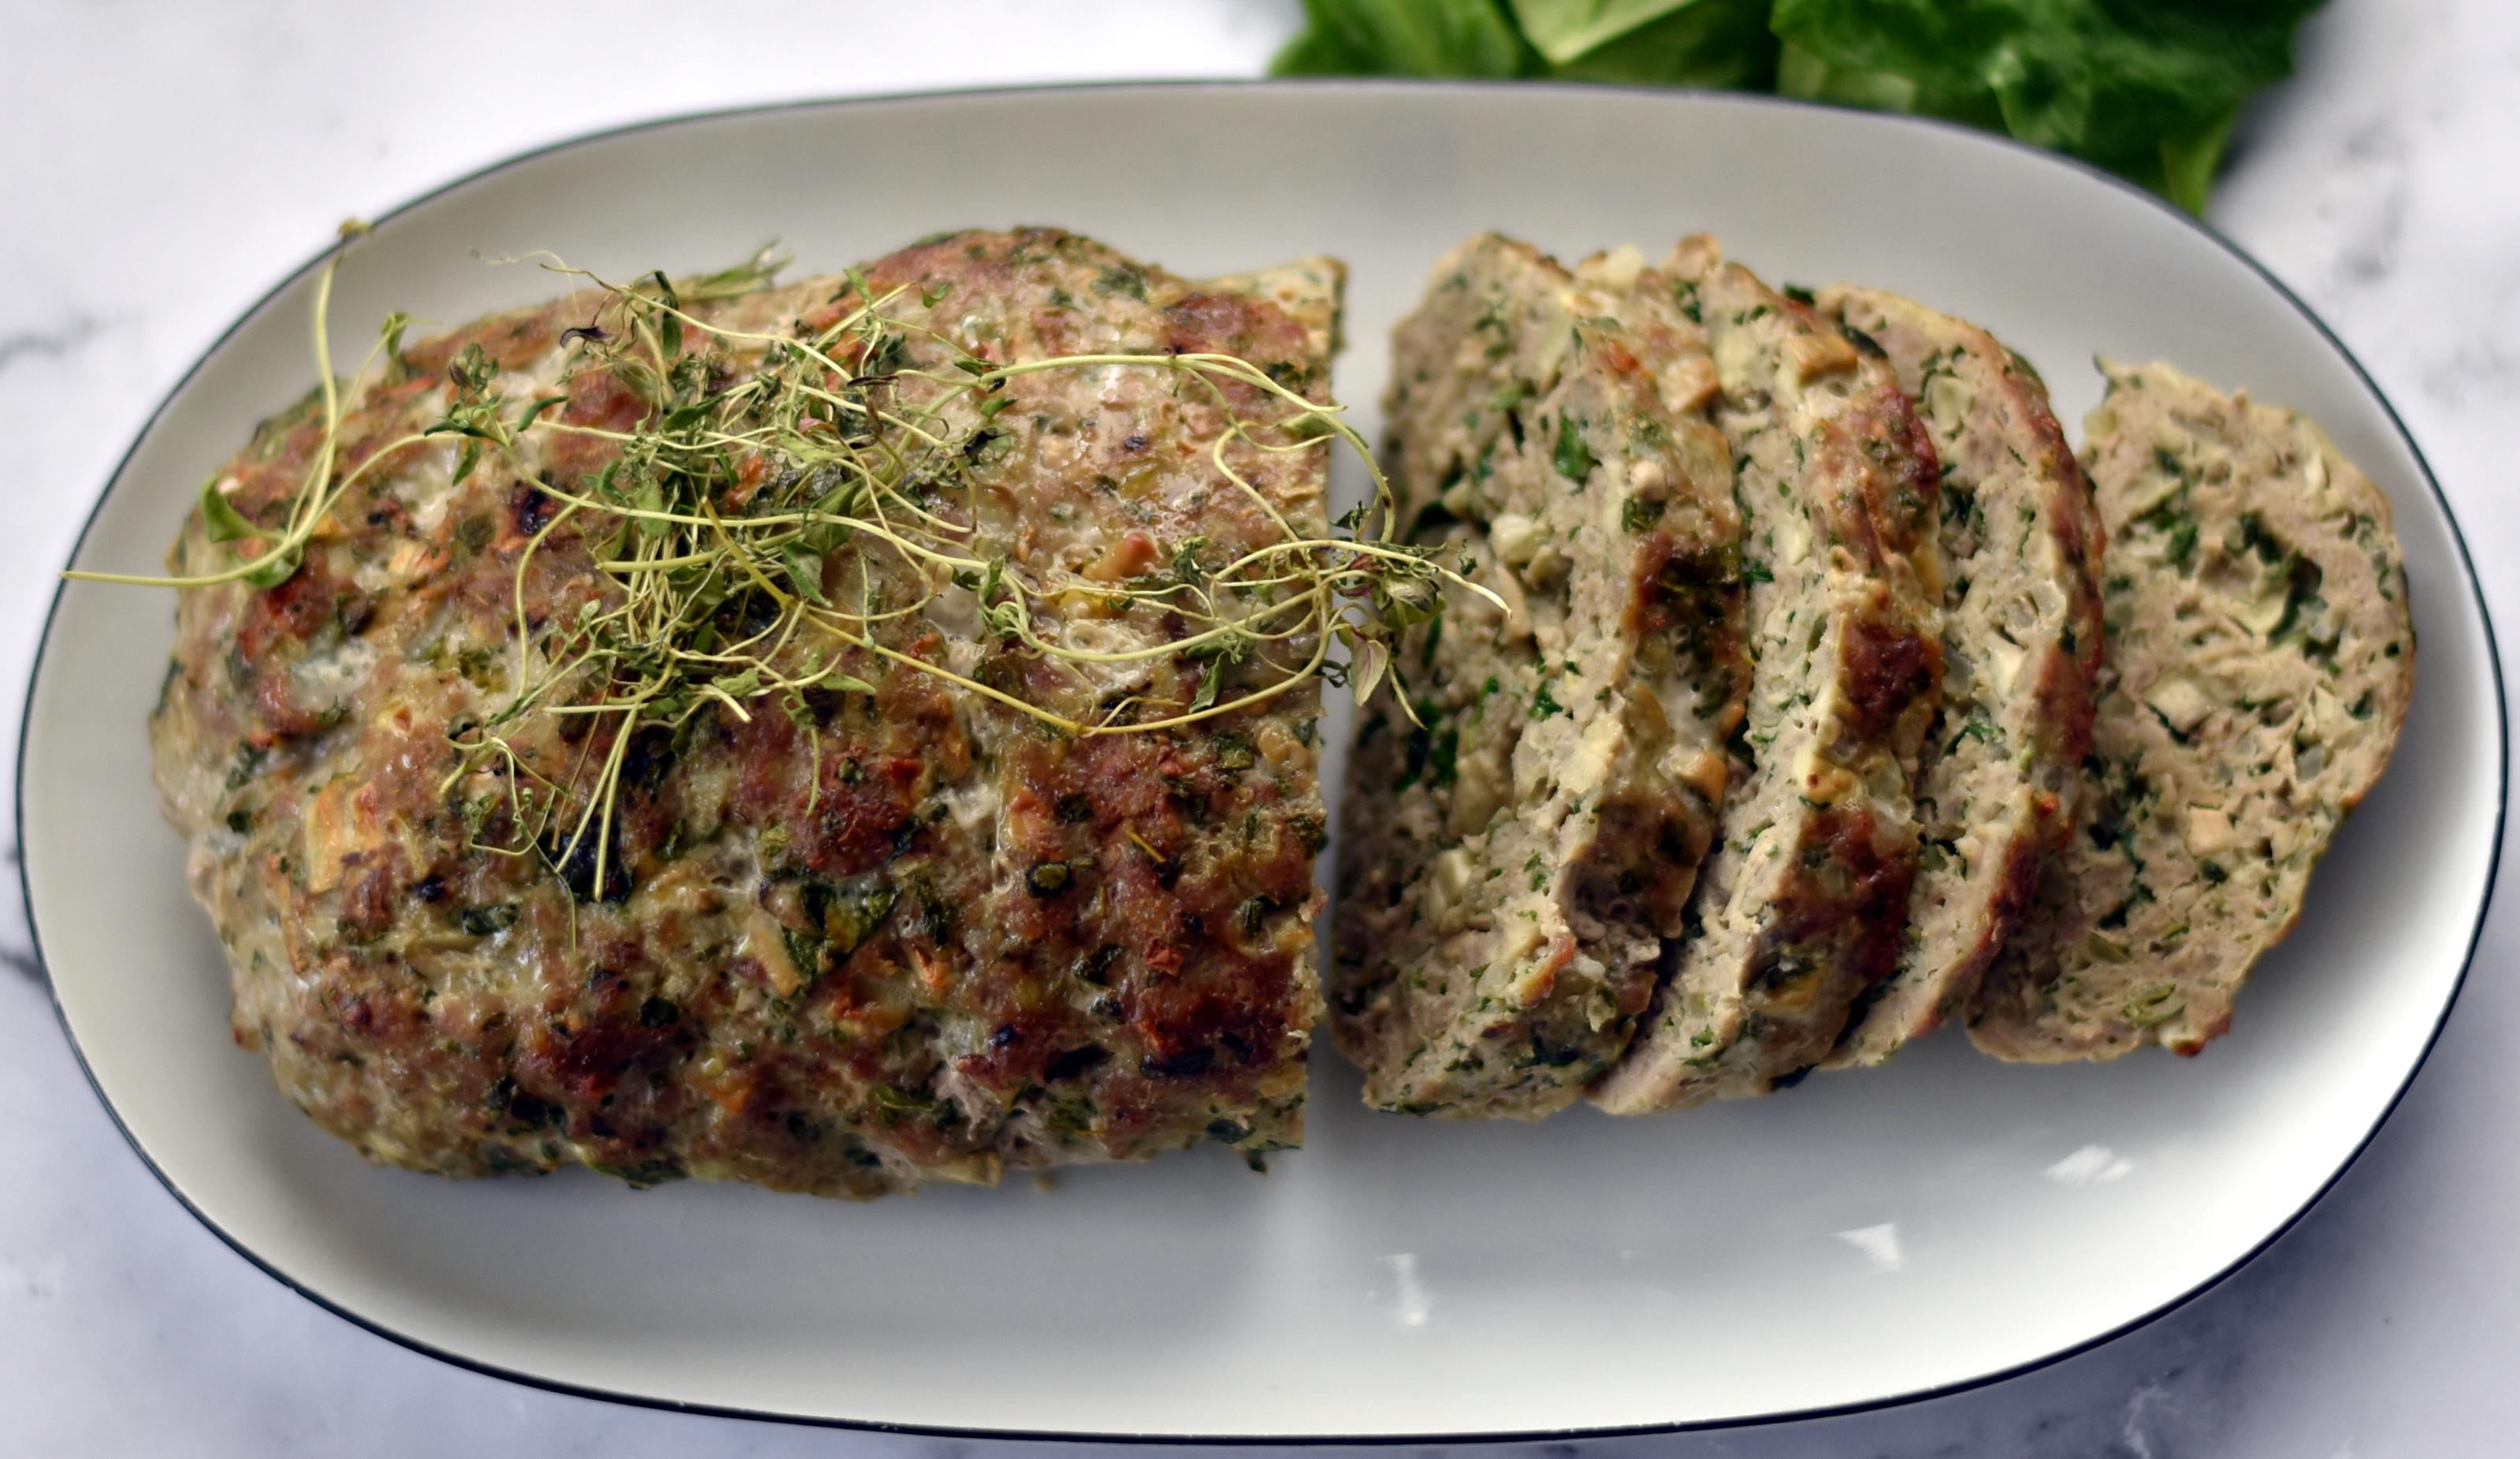 Græsk farsbrød med champignon og timian.